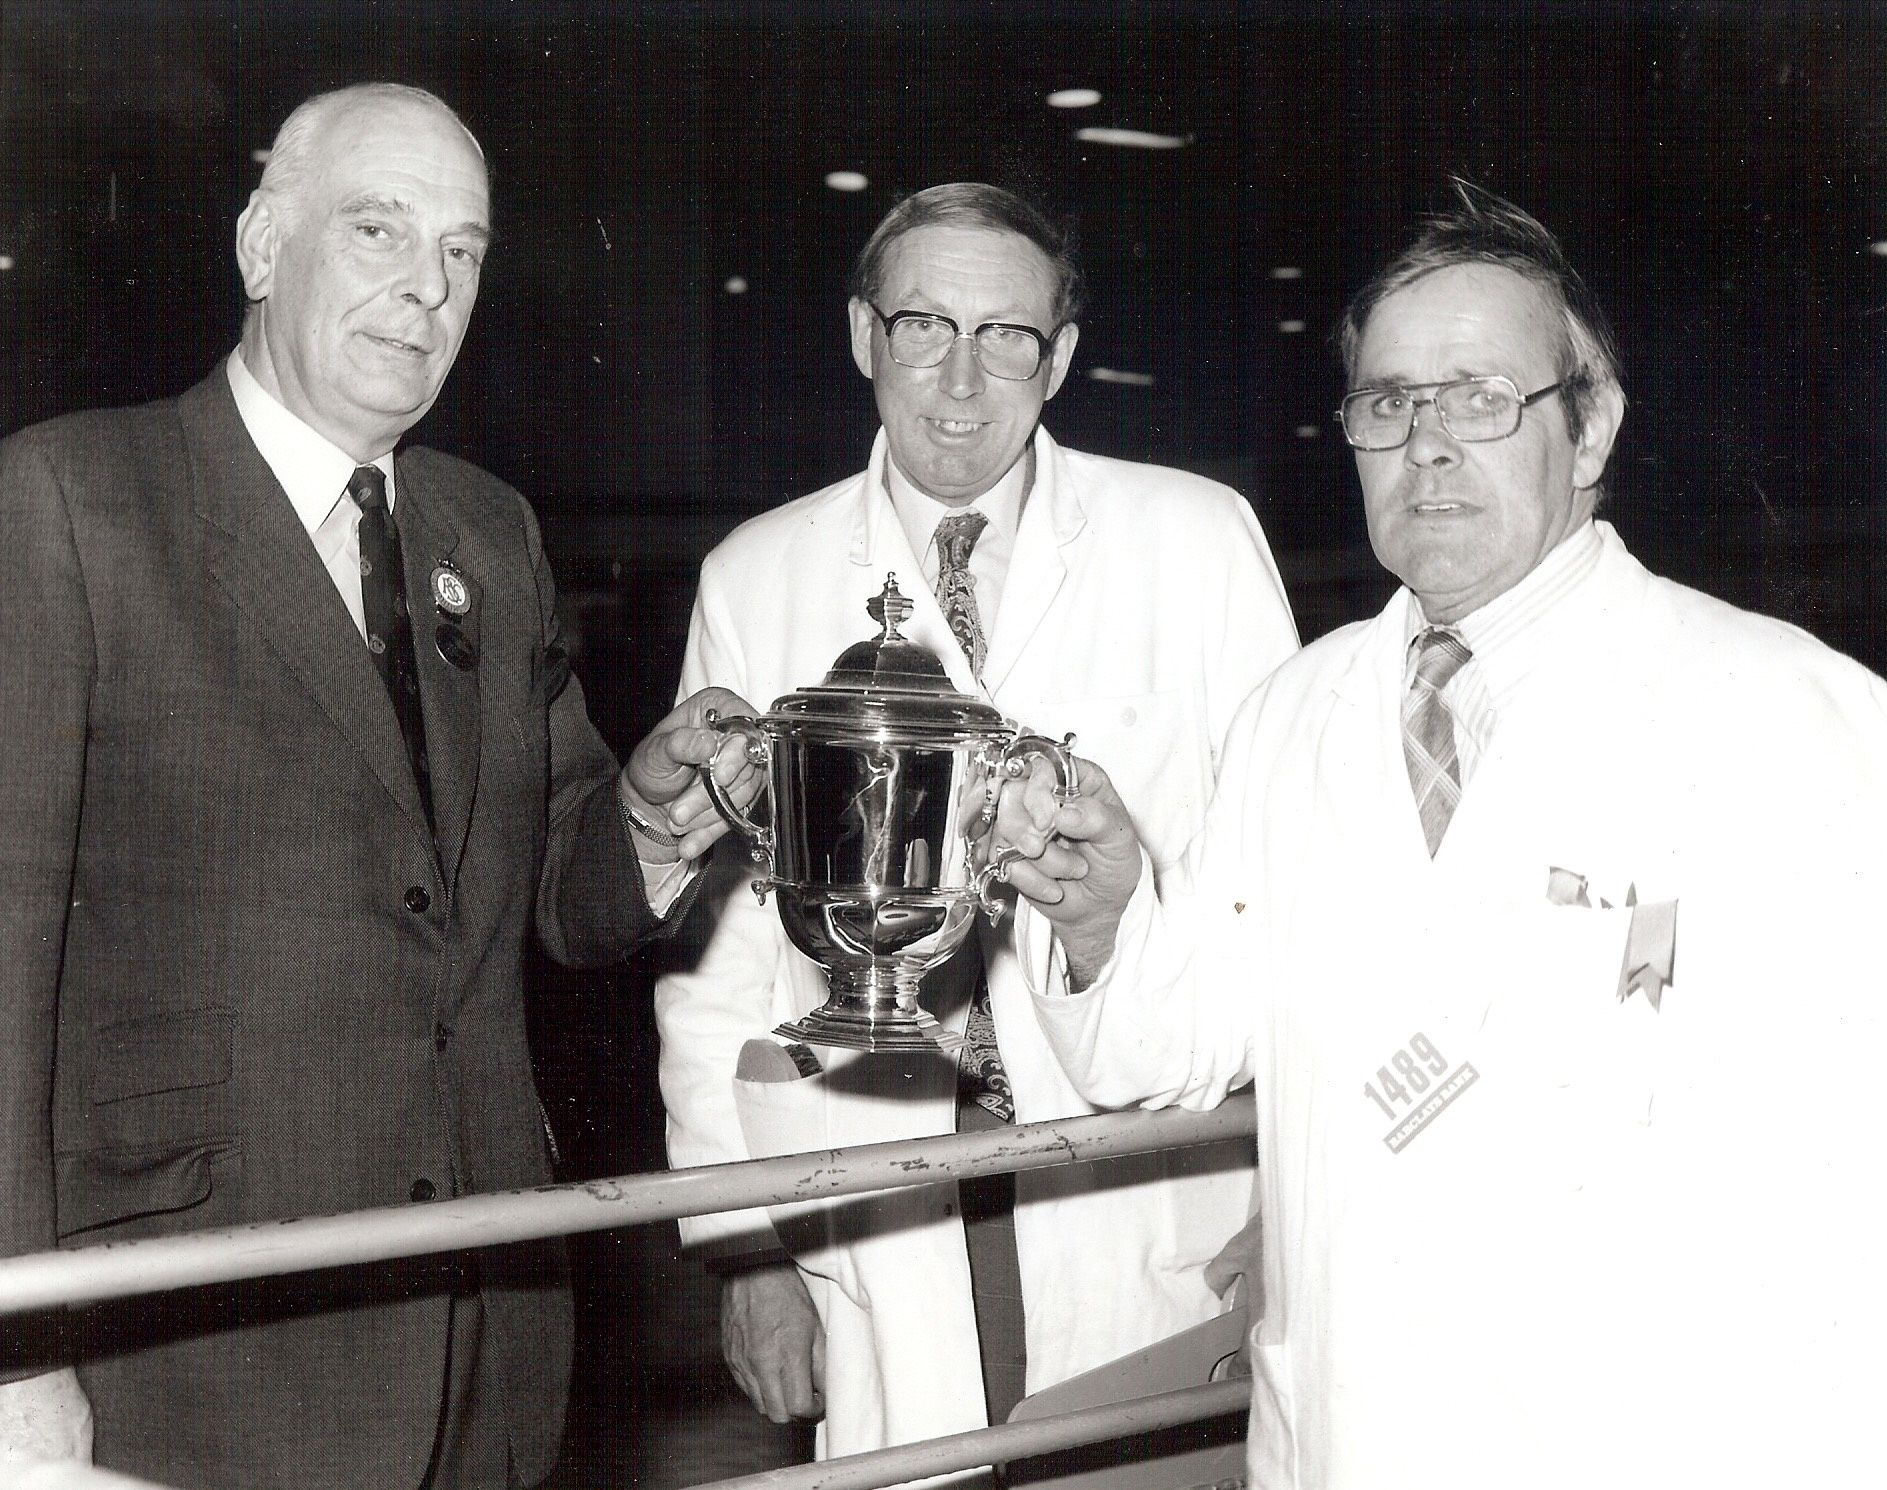 Dick Gough and Reg Simpkin receiving the Royal Smithfield Champion Trophy